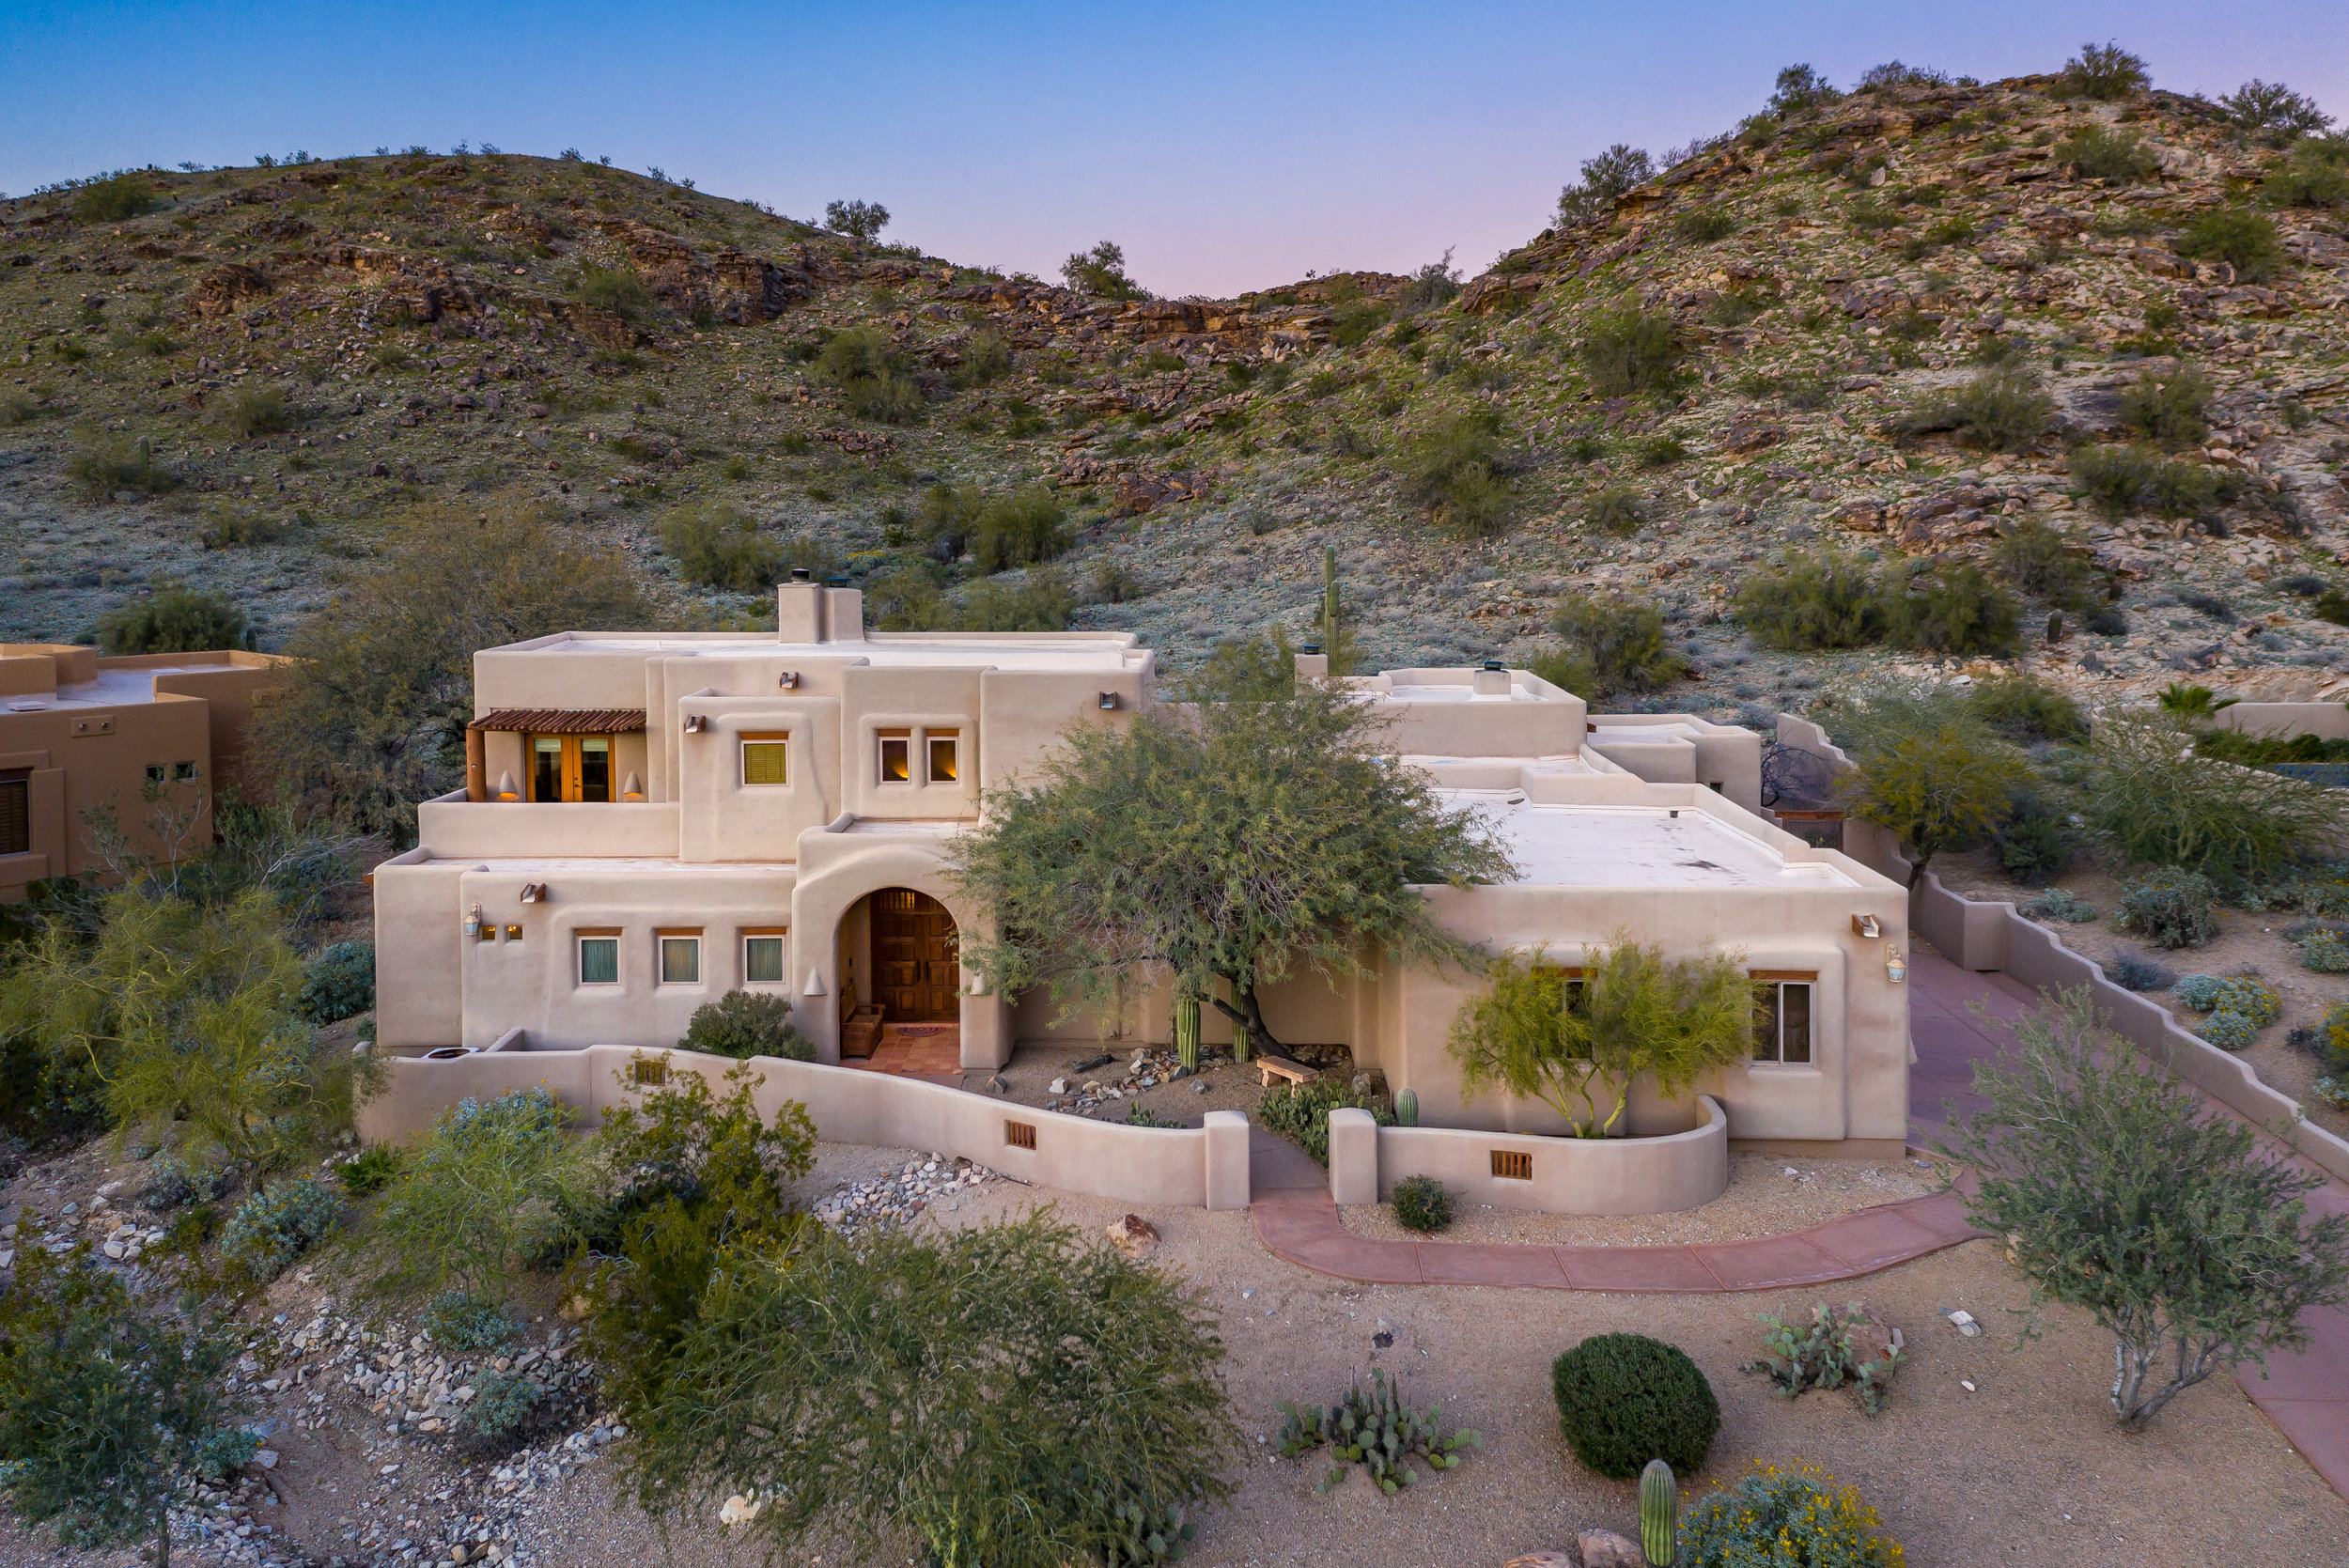 14415 S Canyon DR, Phoenix, AZ 85048 | $860,000